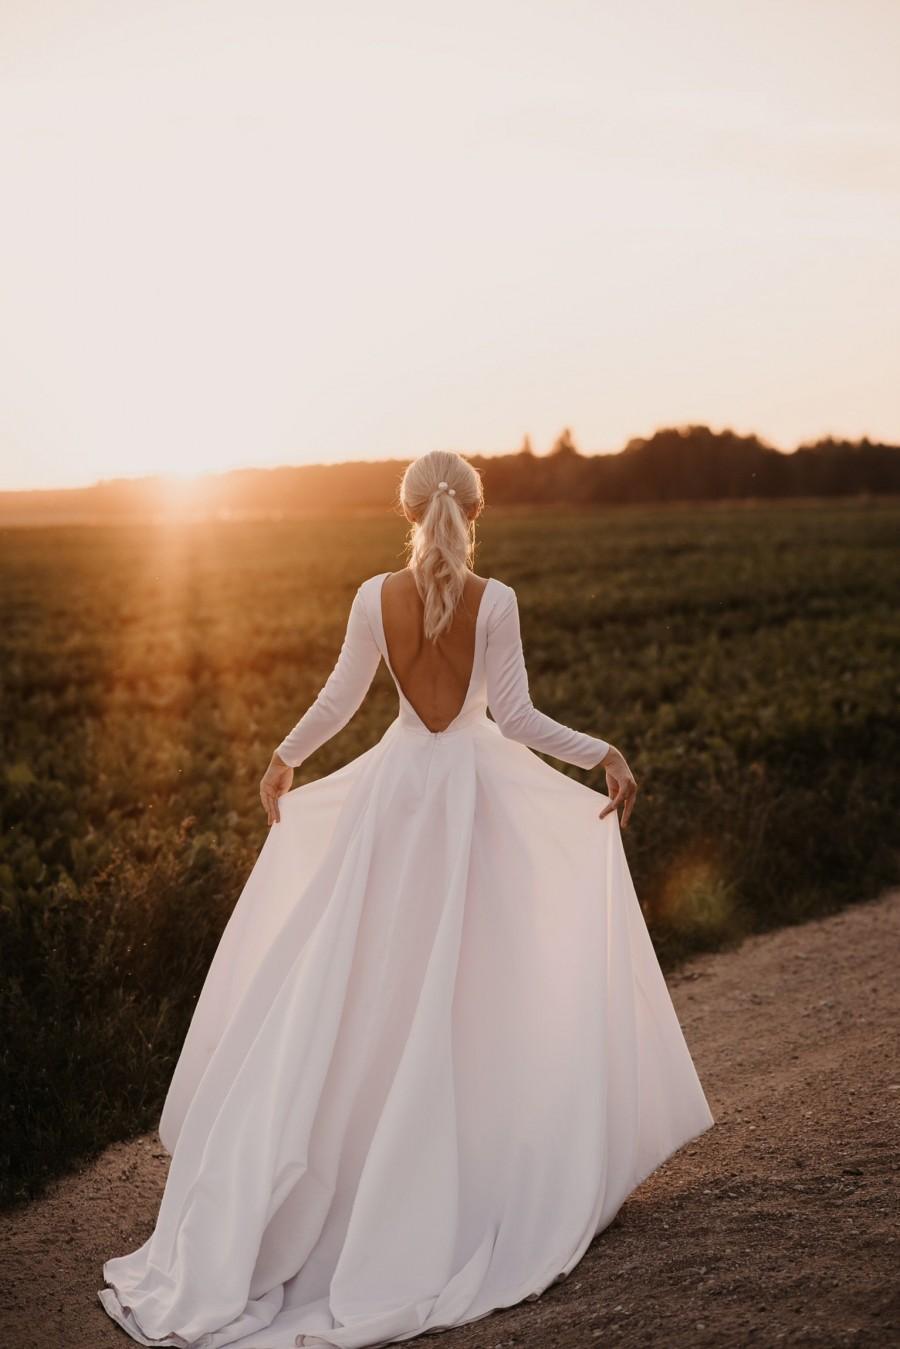 Wedding - Royal open back wedding dress,long sleeve satin dress,boat neckline dress